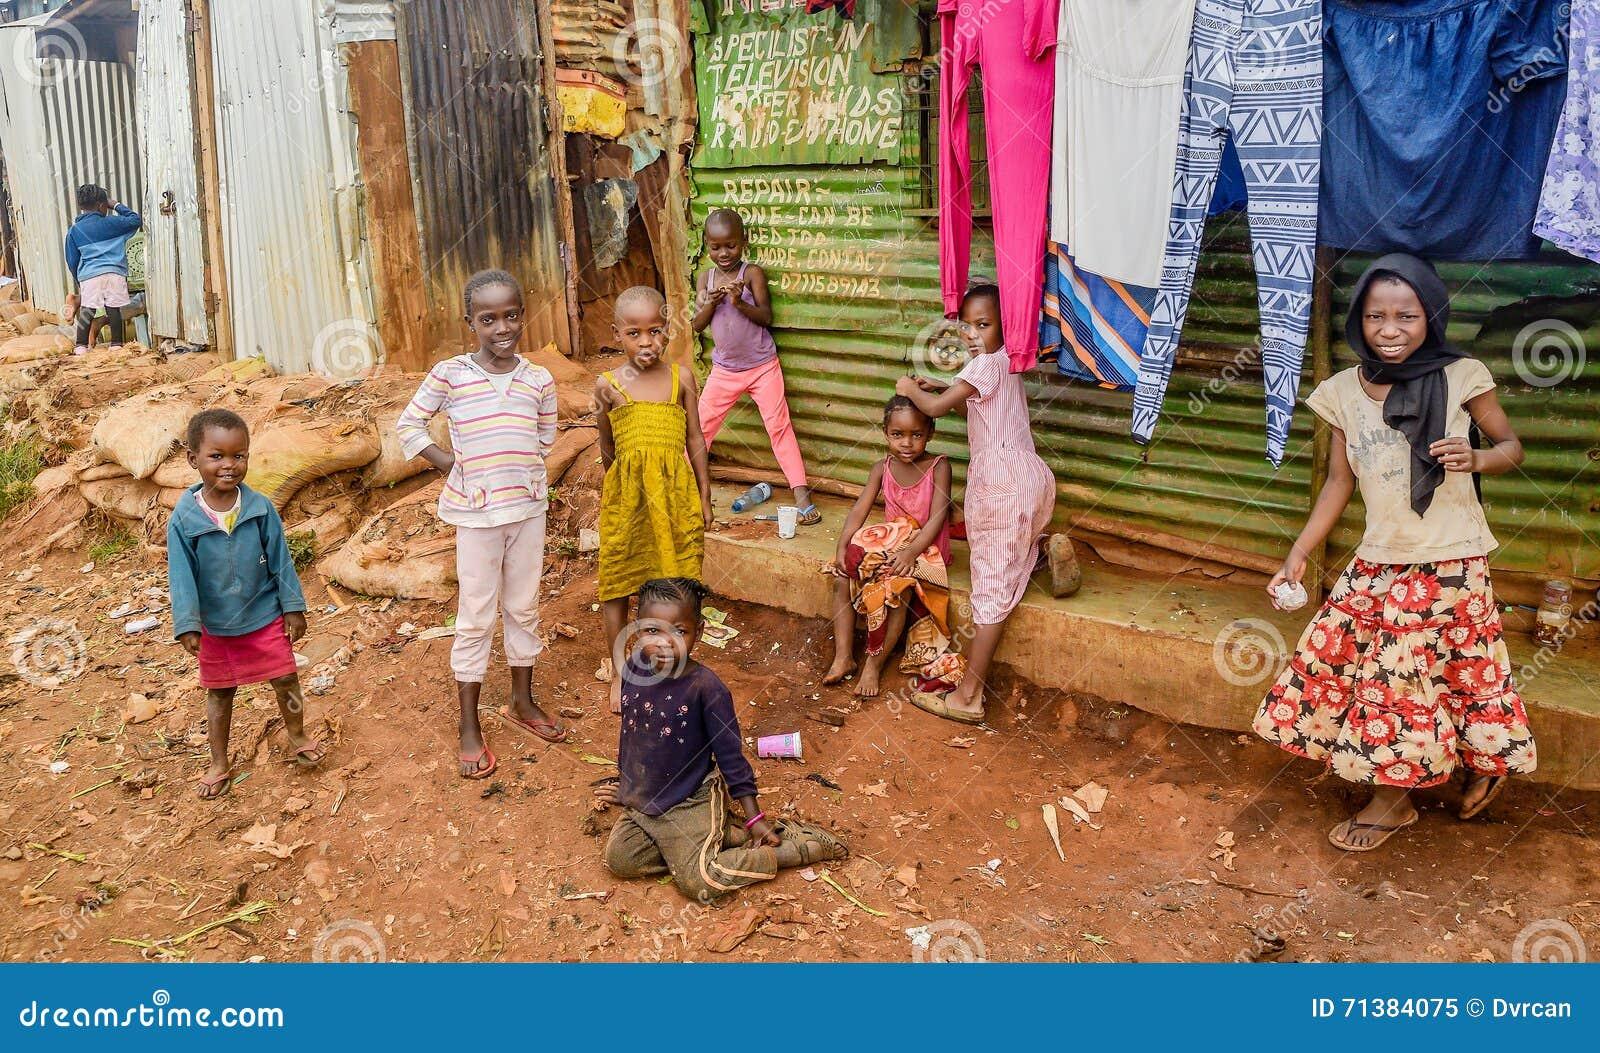 Daily Life Of Children Of Kibera Slum In Nairobi,Kenya ...